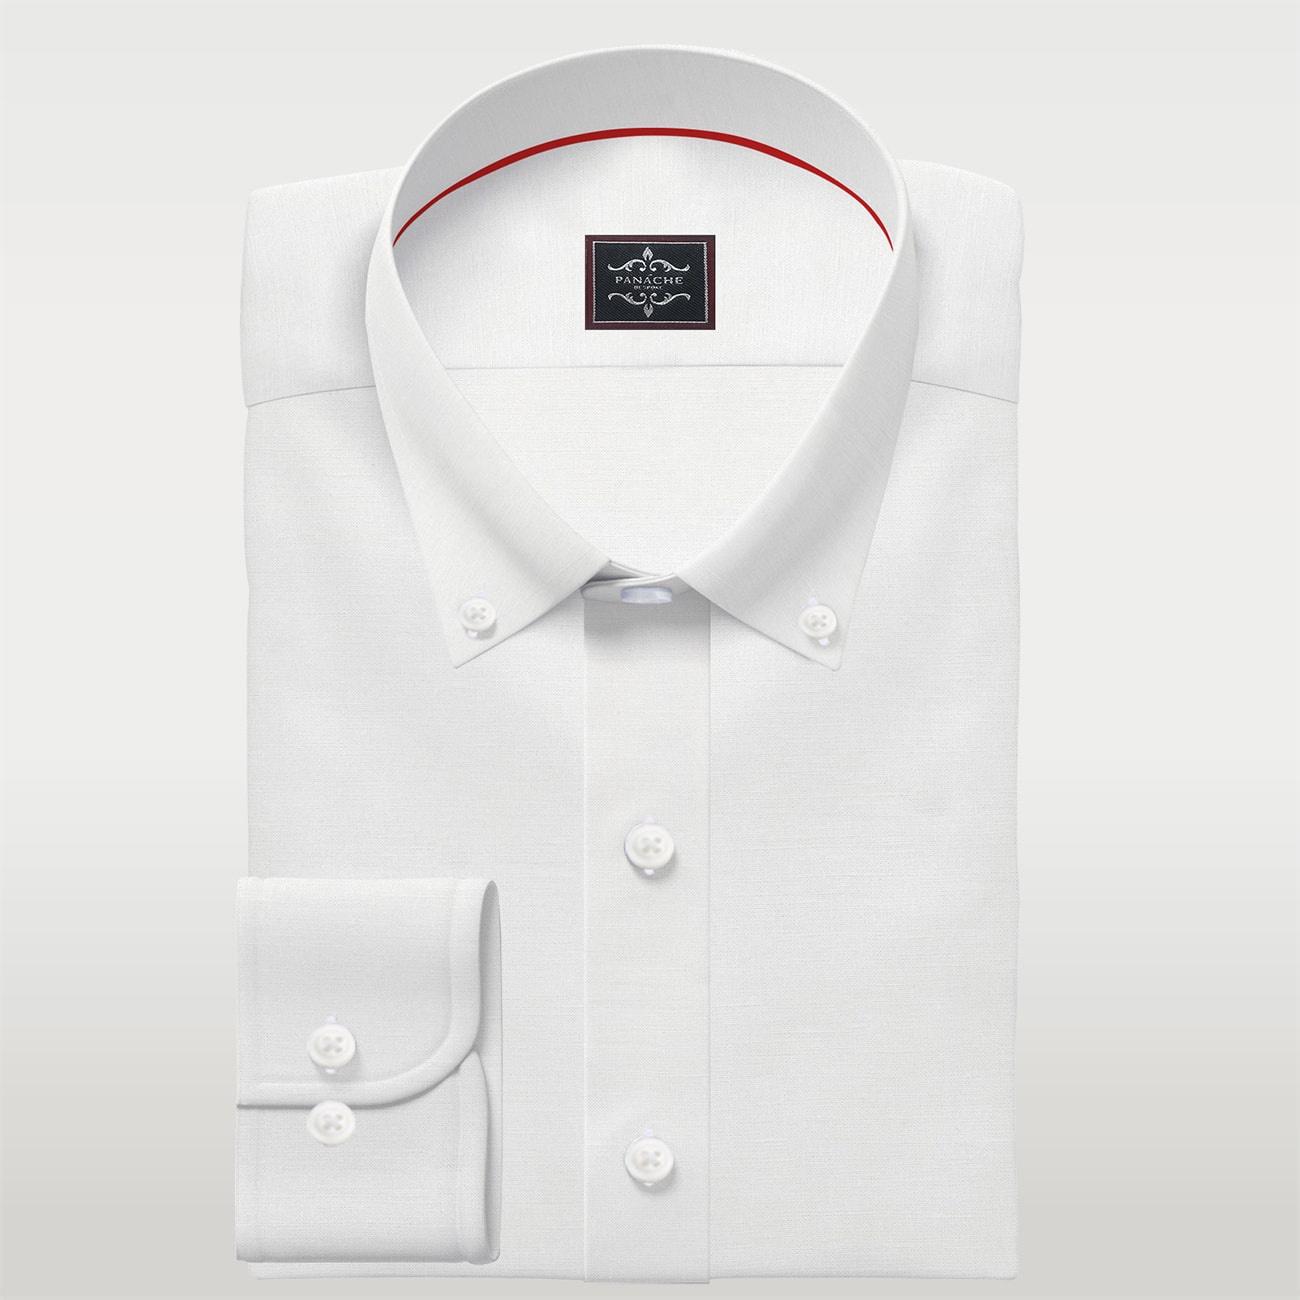 Luxury White Linen Button Down Shirt | Mens Custom Buttoned Shirt